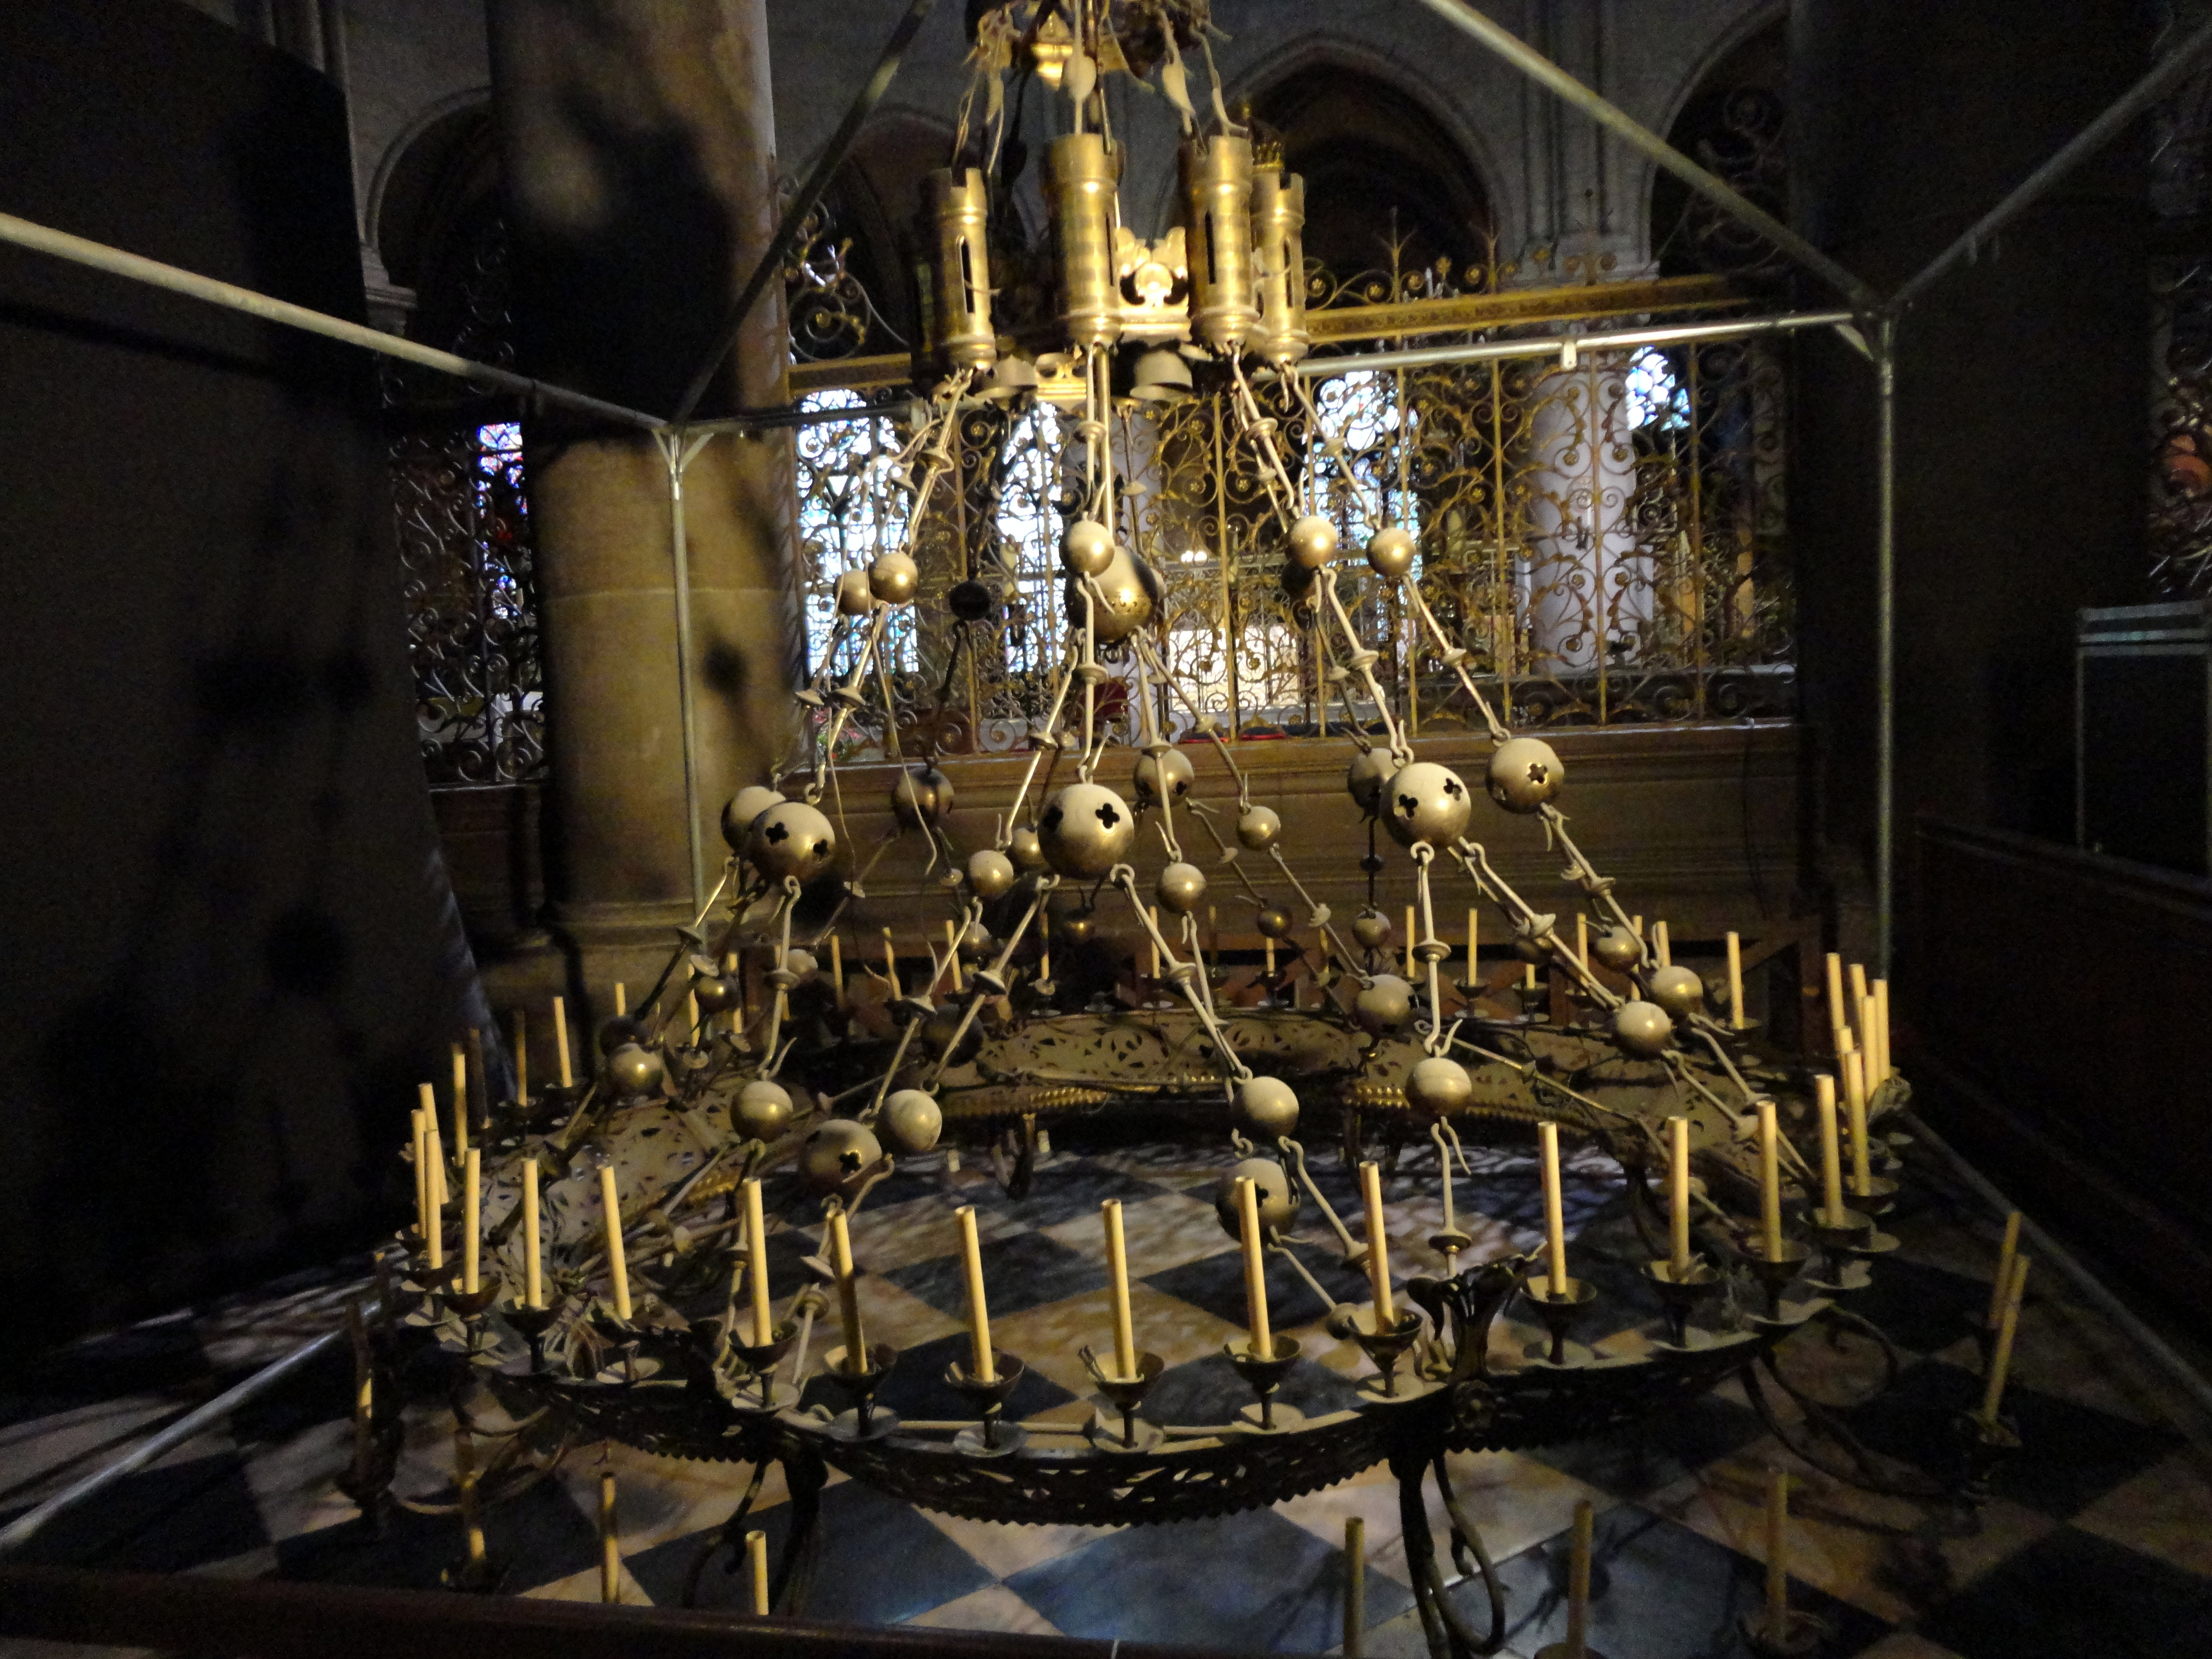 Fileparis notre dame cathedral interior corona chandelier 01g fileparis notre dame cathedral interior corona chandelier 01g mozeypictures Images